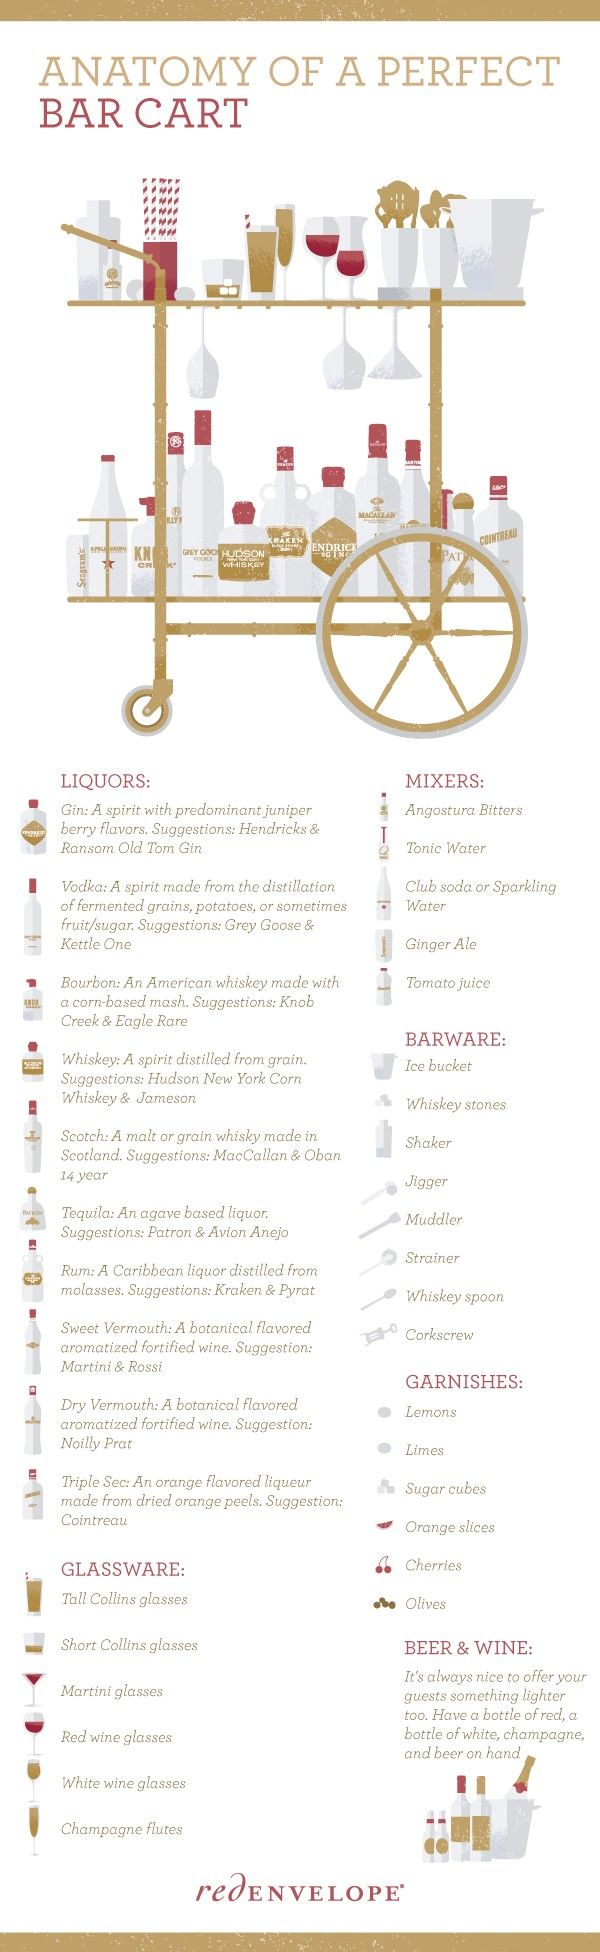 Anatomy of a perfect bar cart pinterest